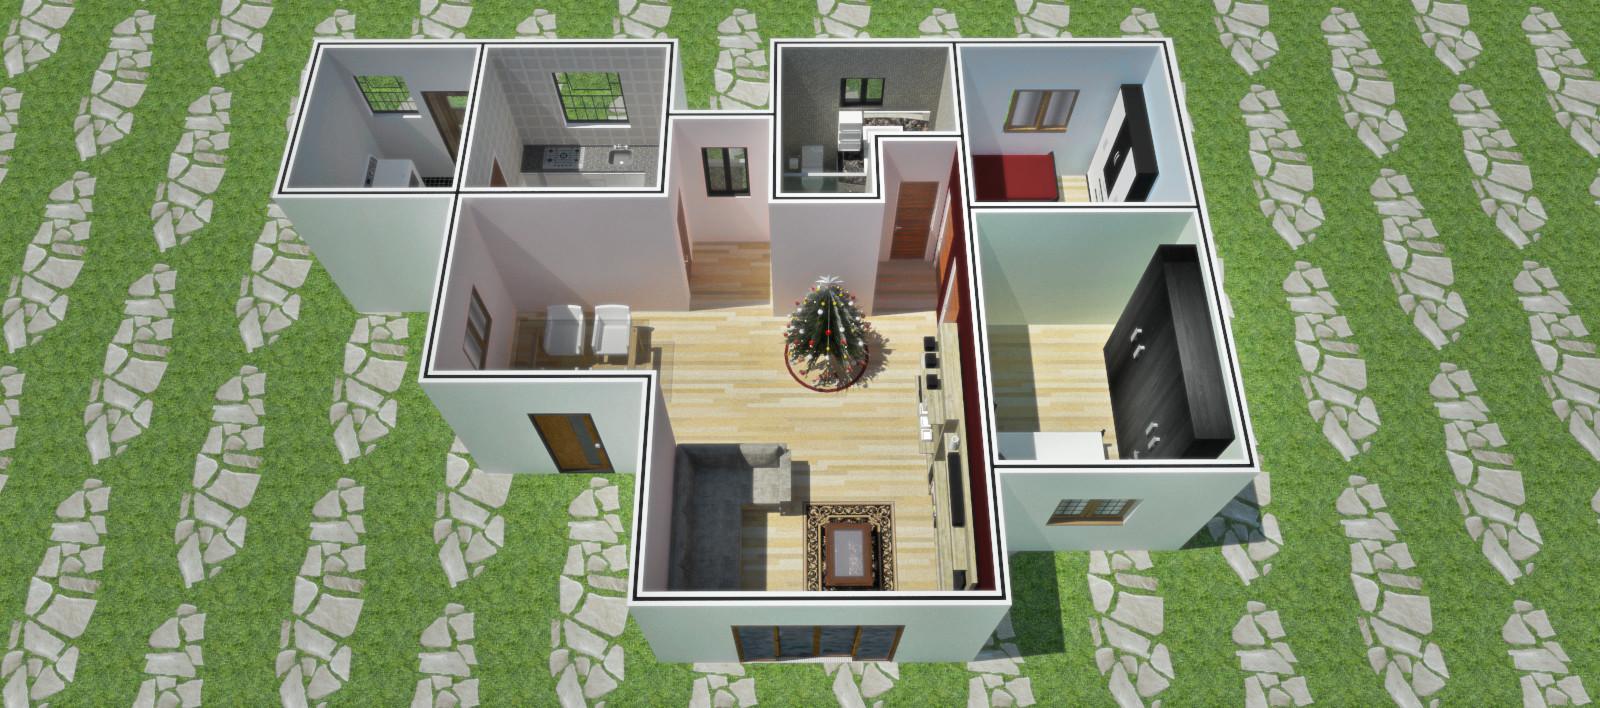 Aline de queiros projeto casa completo